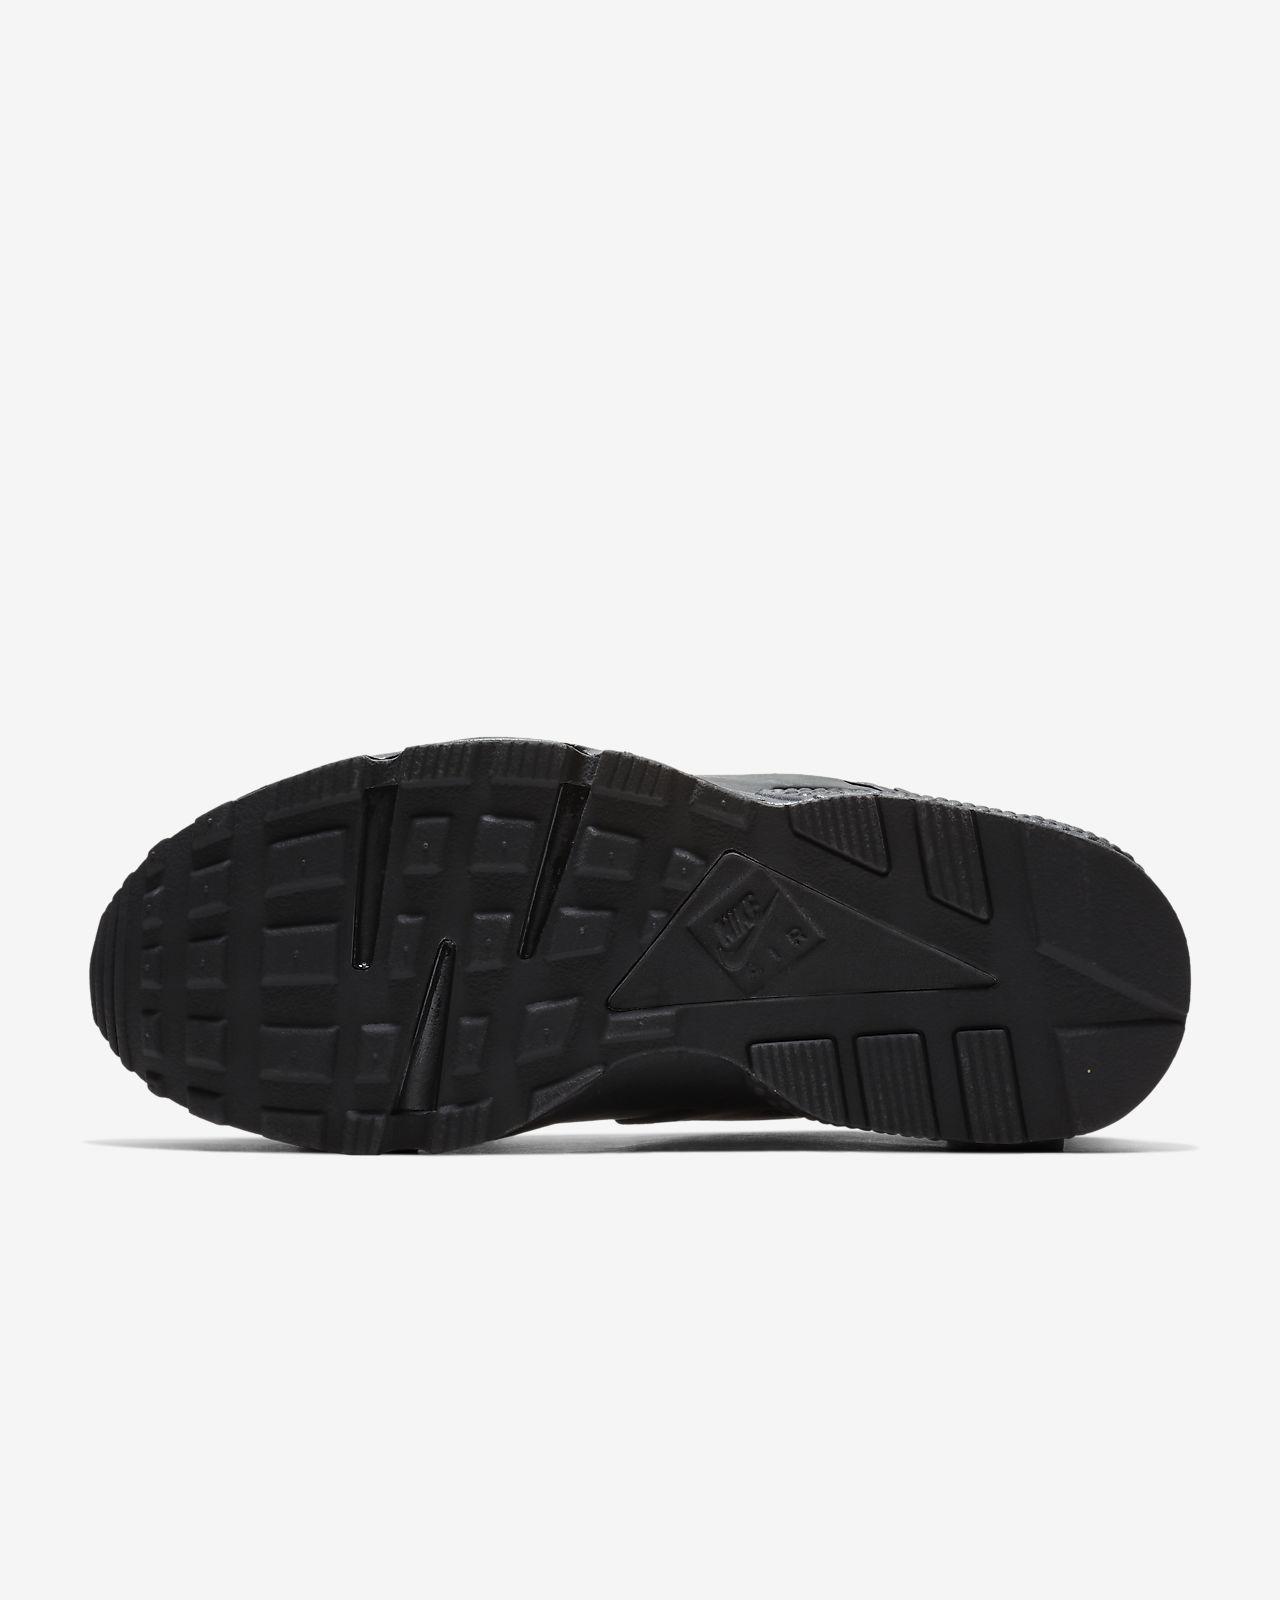 d8a5baa1798a Nike Air Huarache Women s Shoe. Nike.com AU